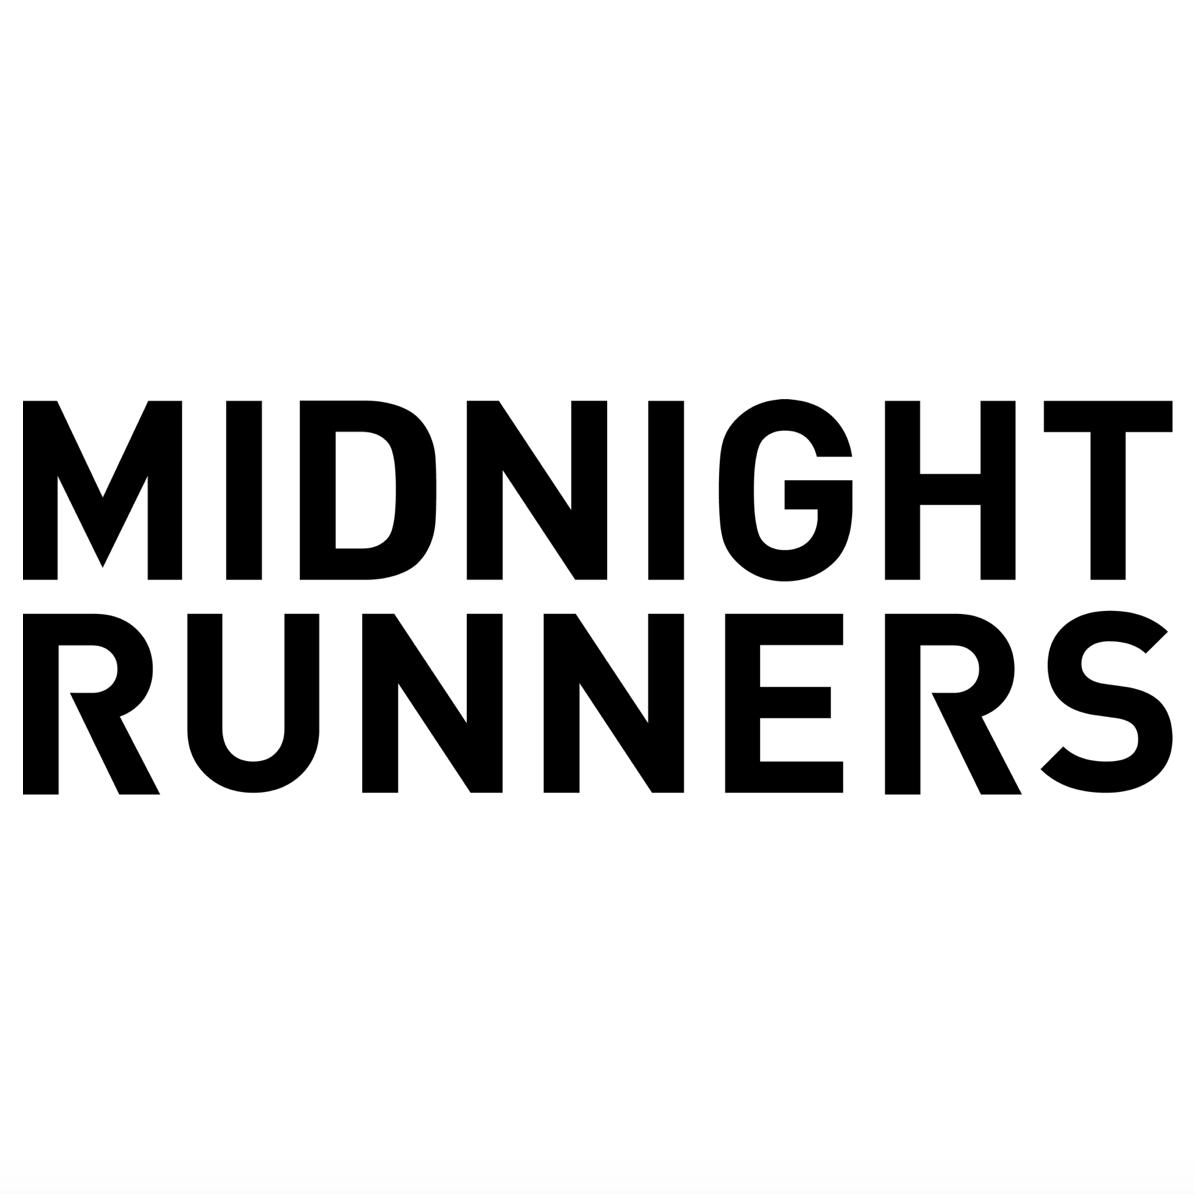 Midnight Runners  7b72dba50